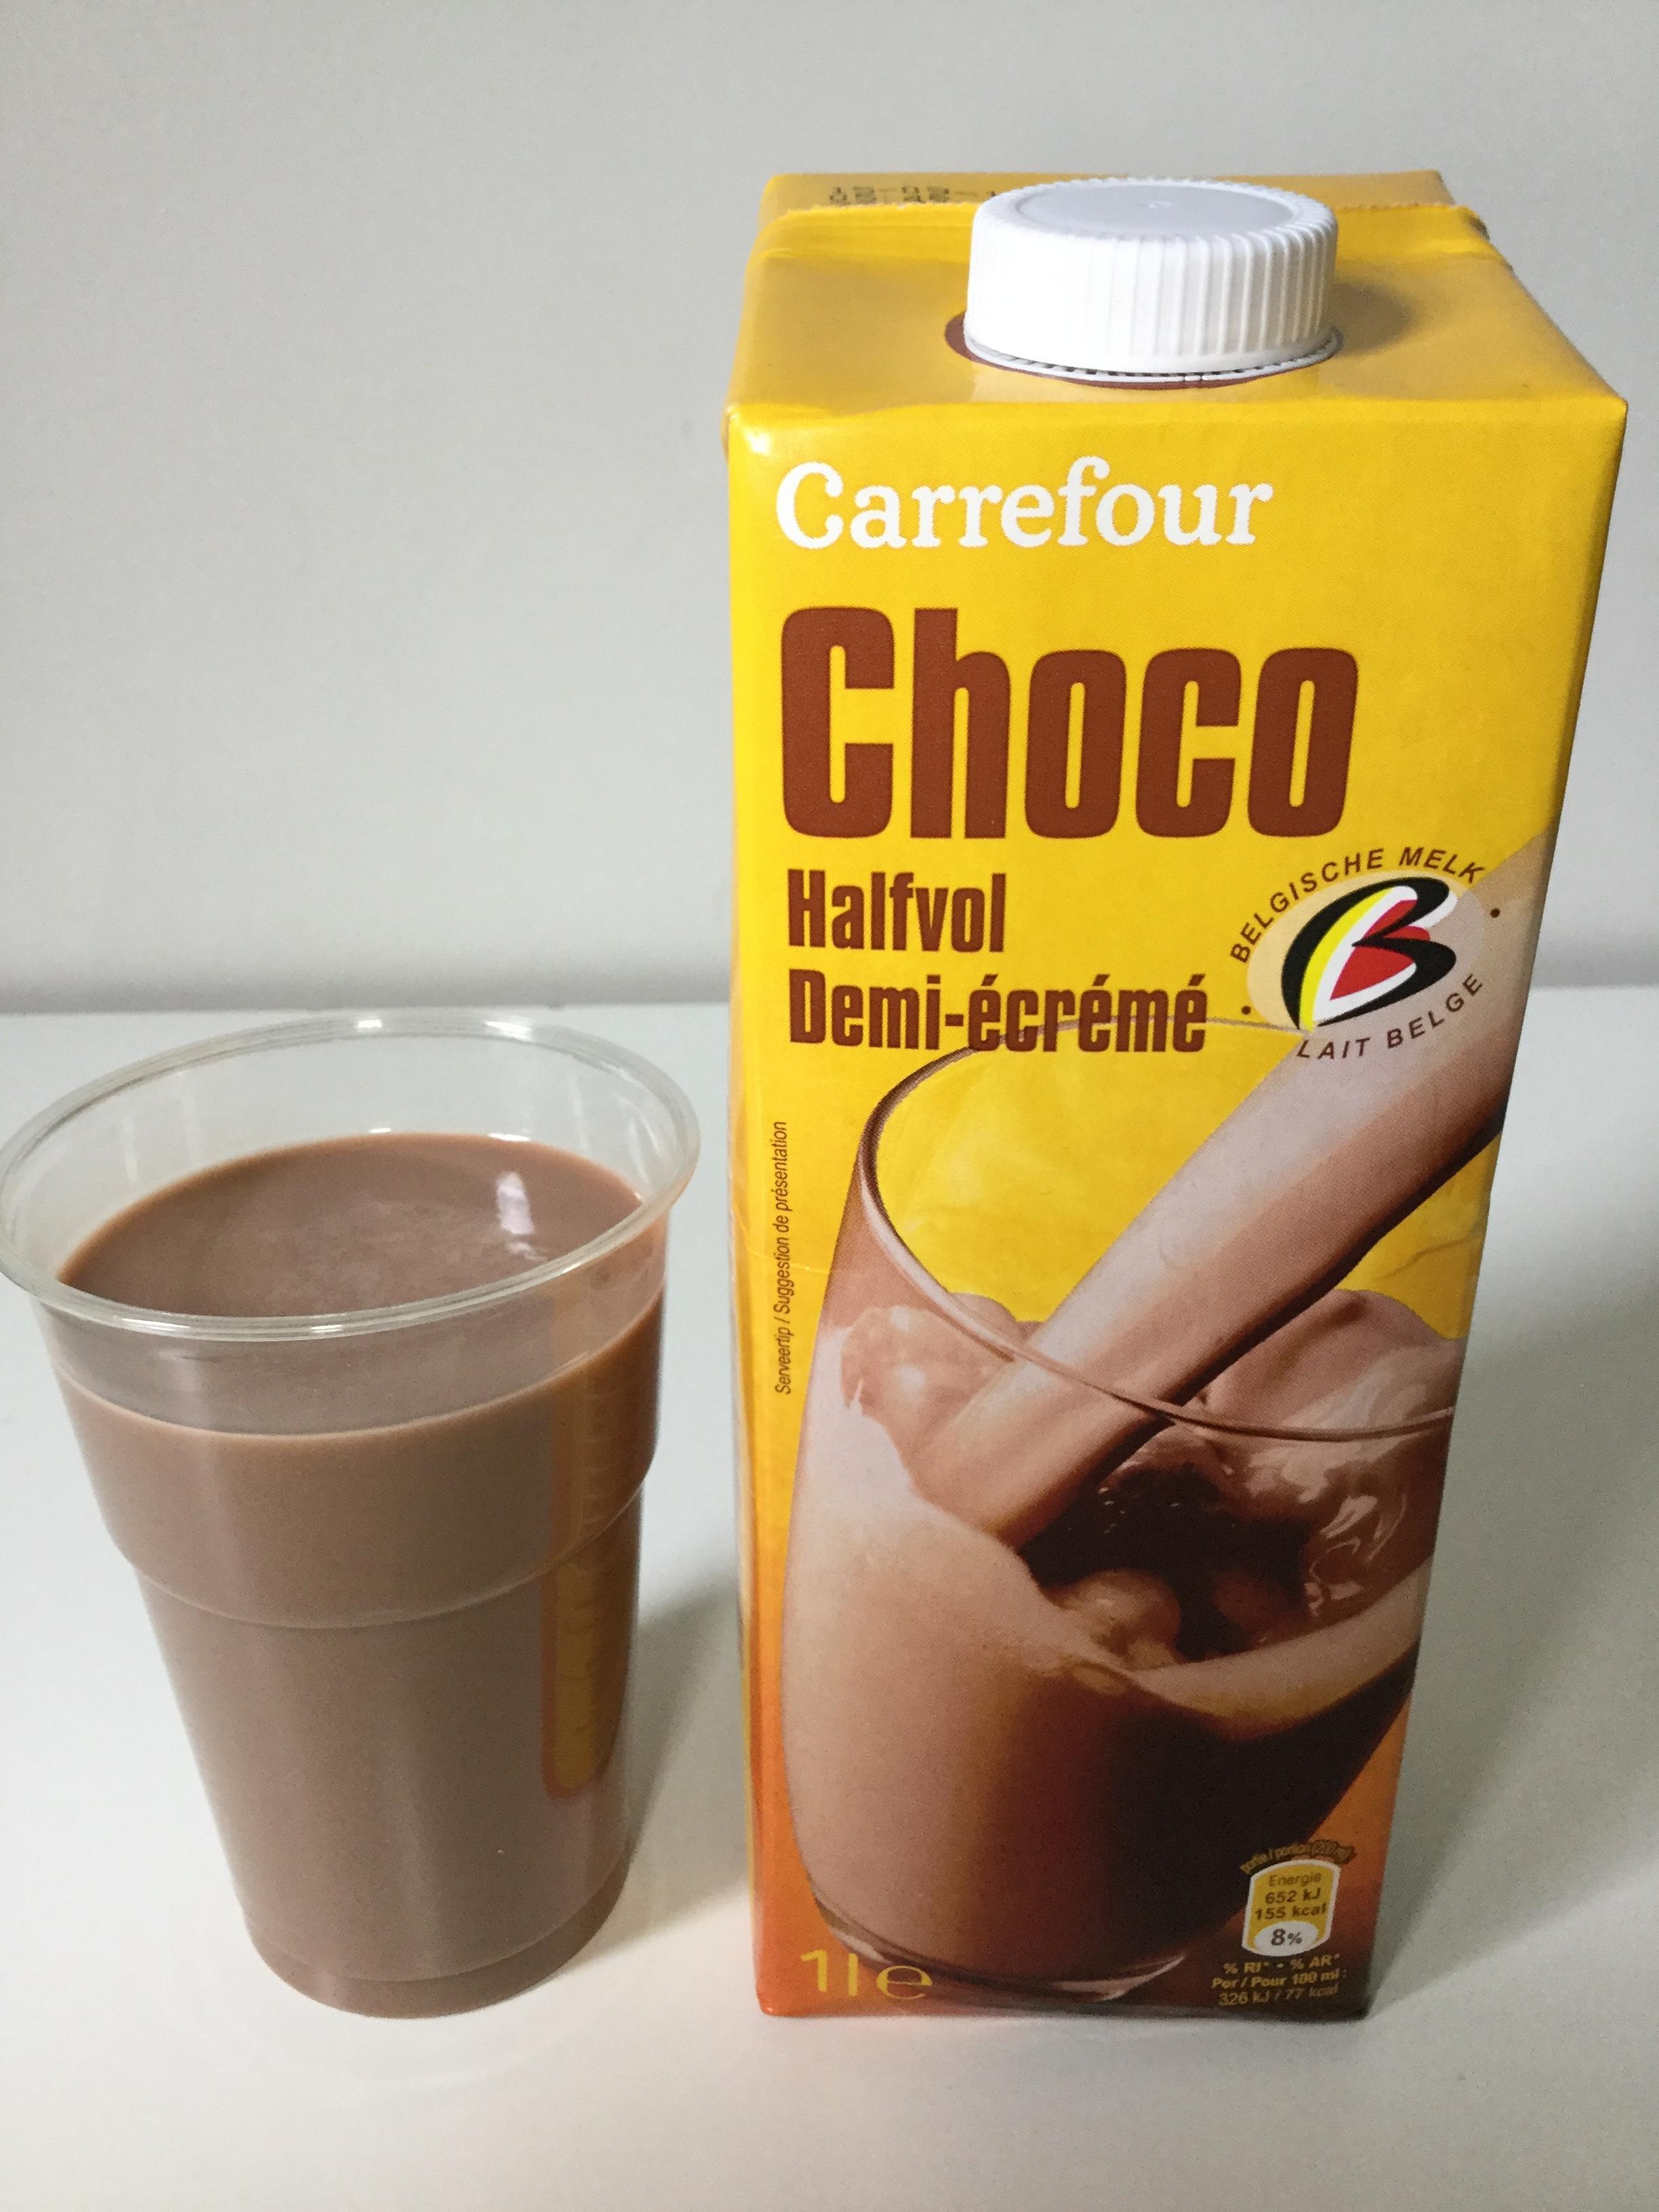 Carrefour Choco Halfvol Cup